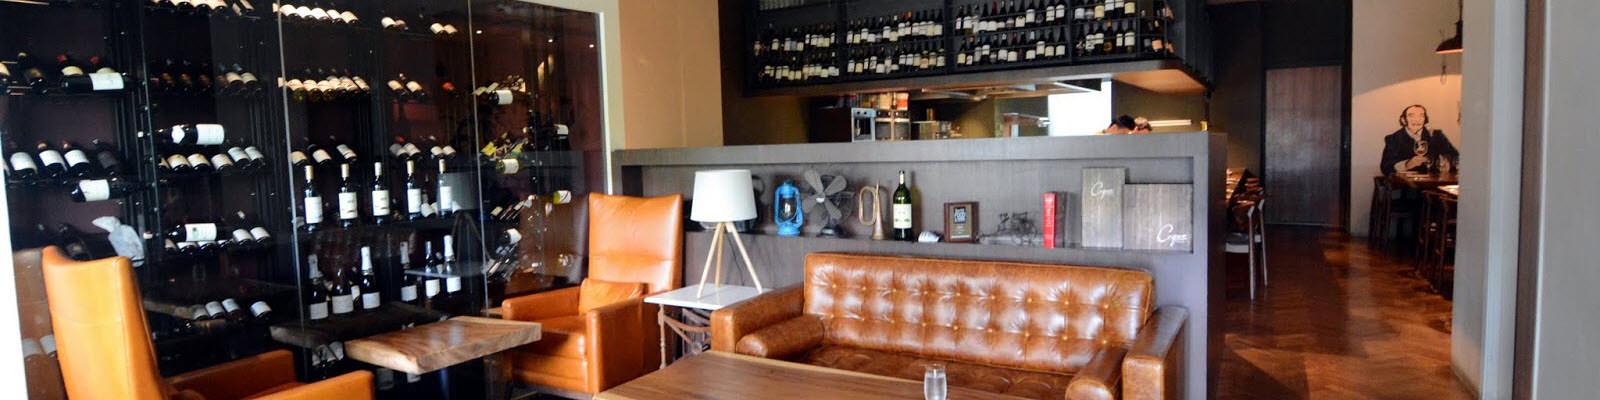 Wine bar setting